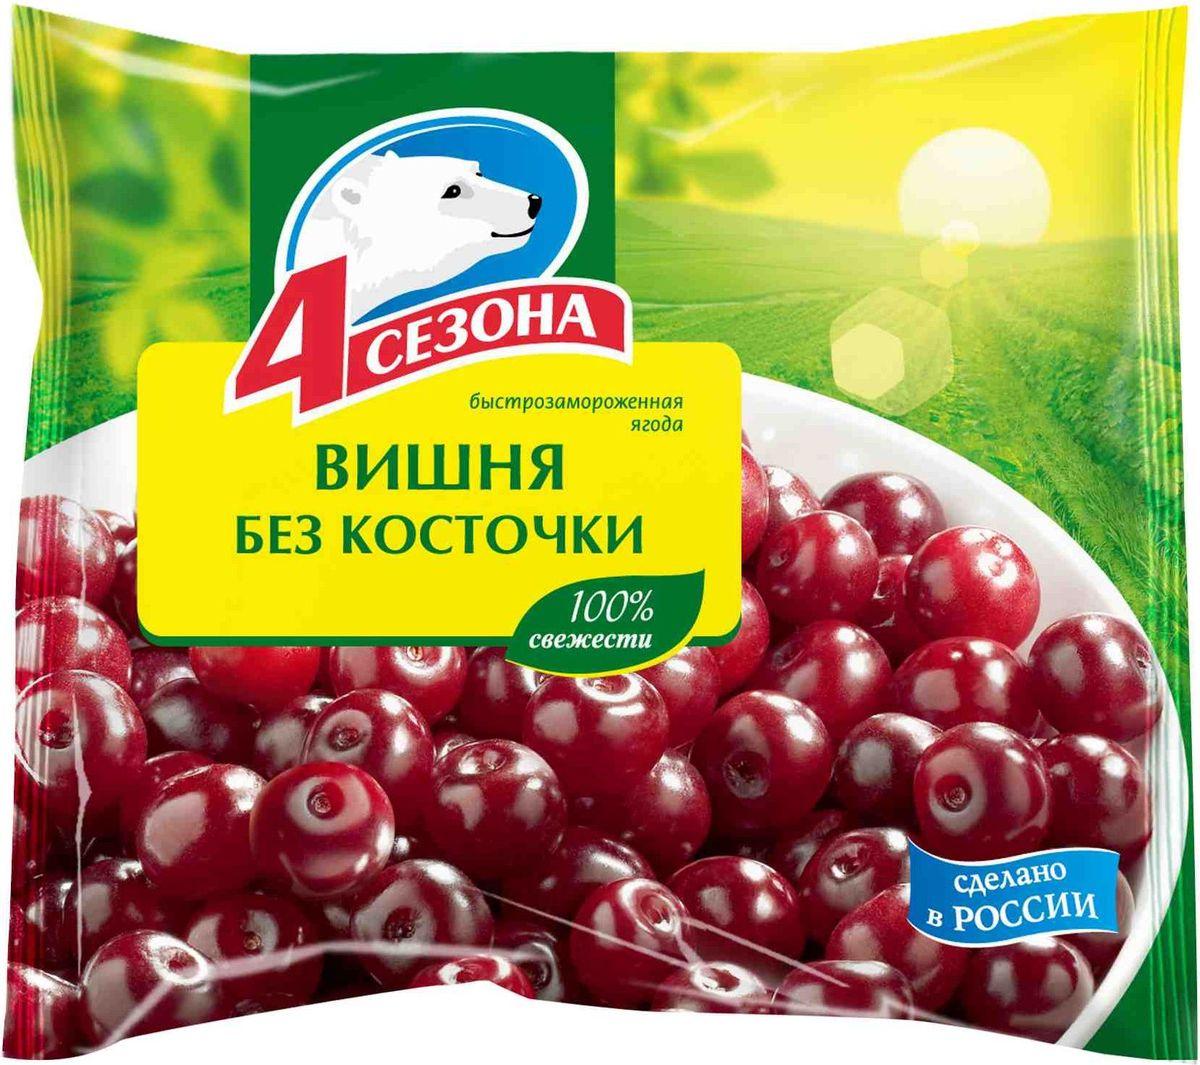 4 Сезона Вишня без косточки, 300 г 4 сезона клубника 300 г